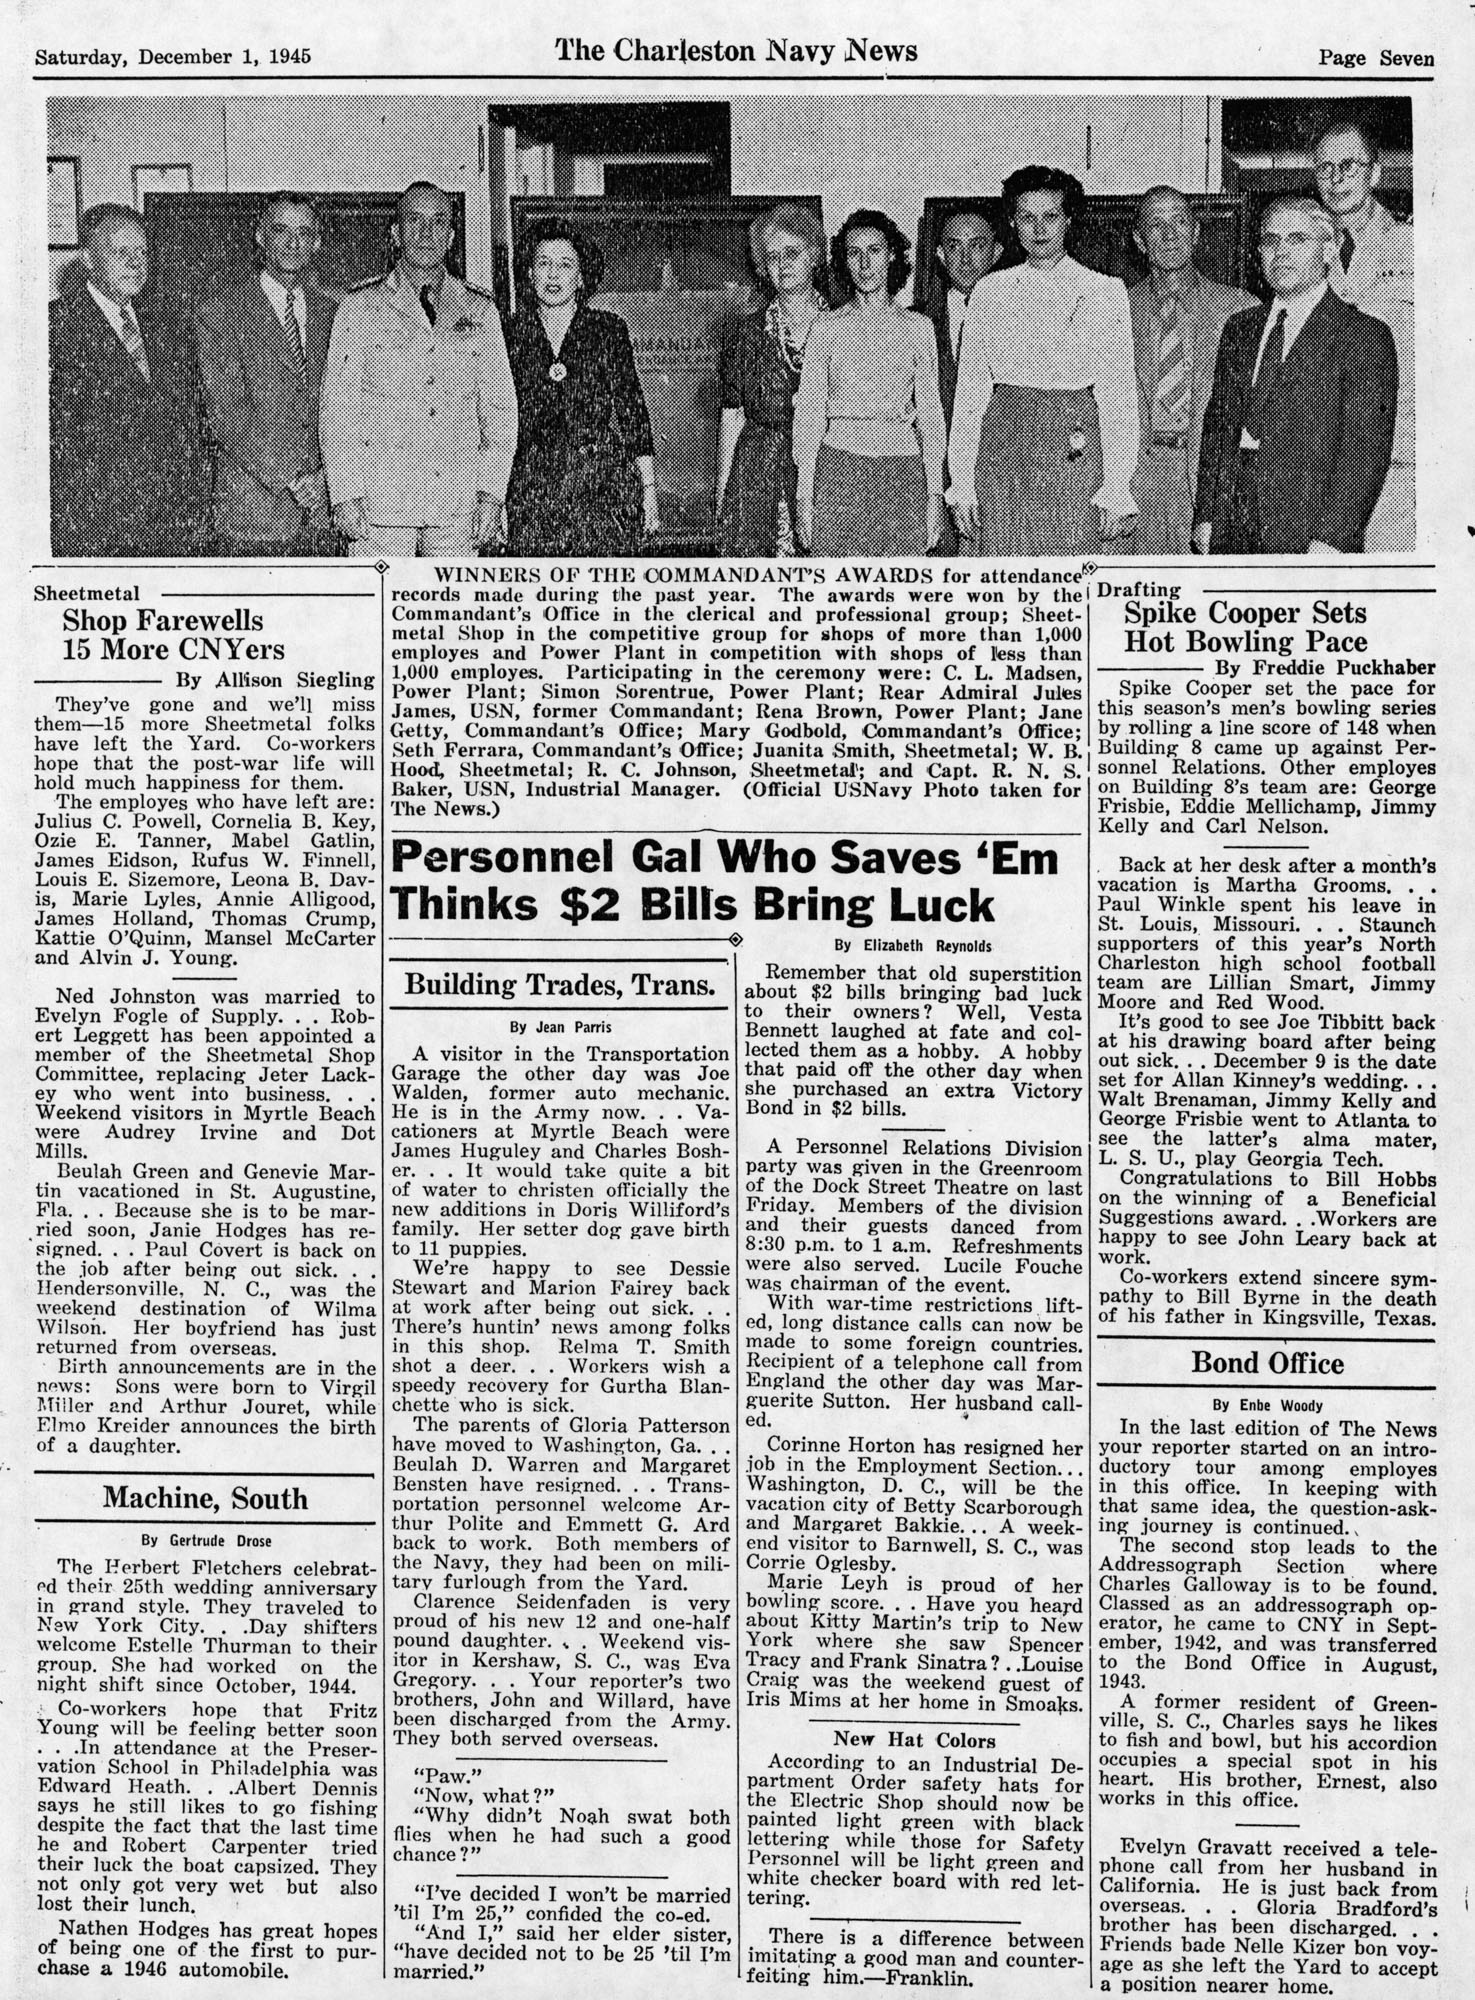 The Charleston Navy News, Volume 4, Edition 11, page vii